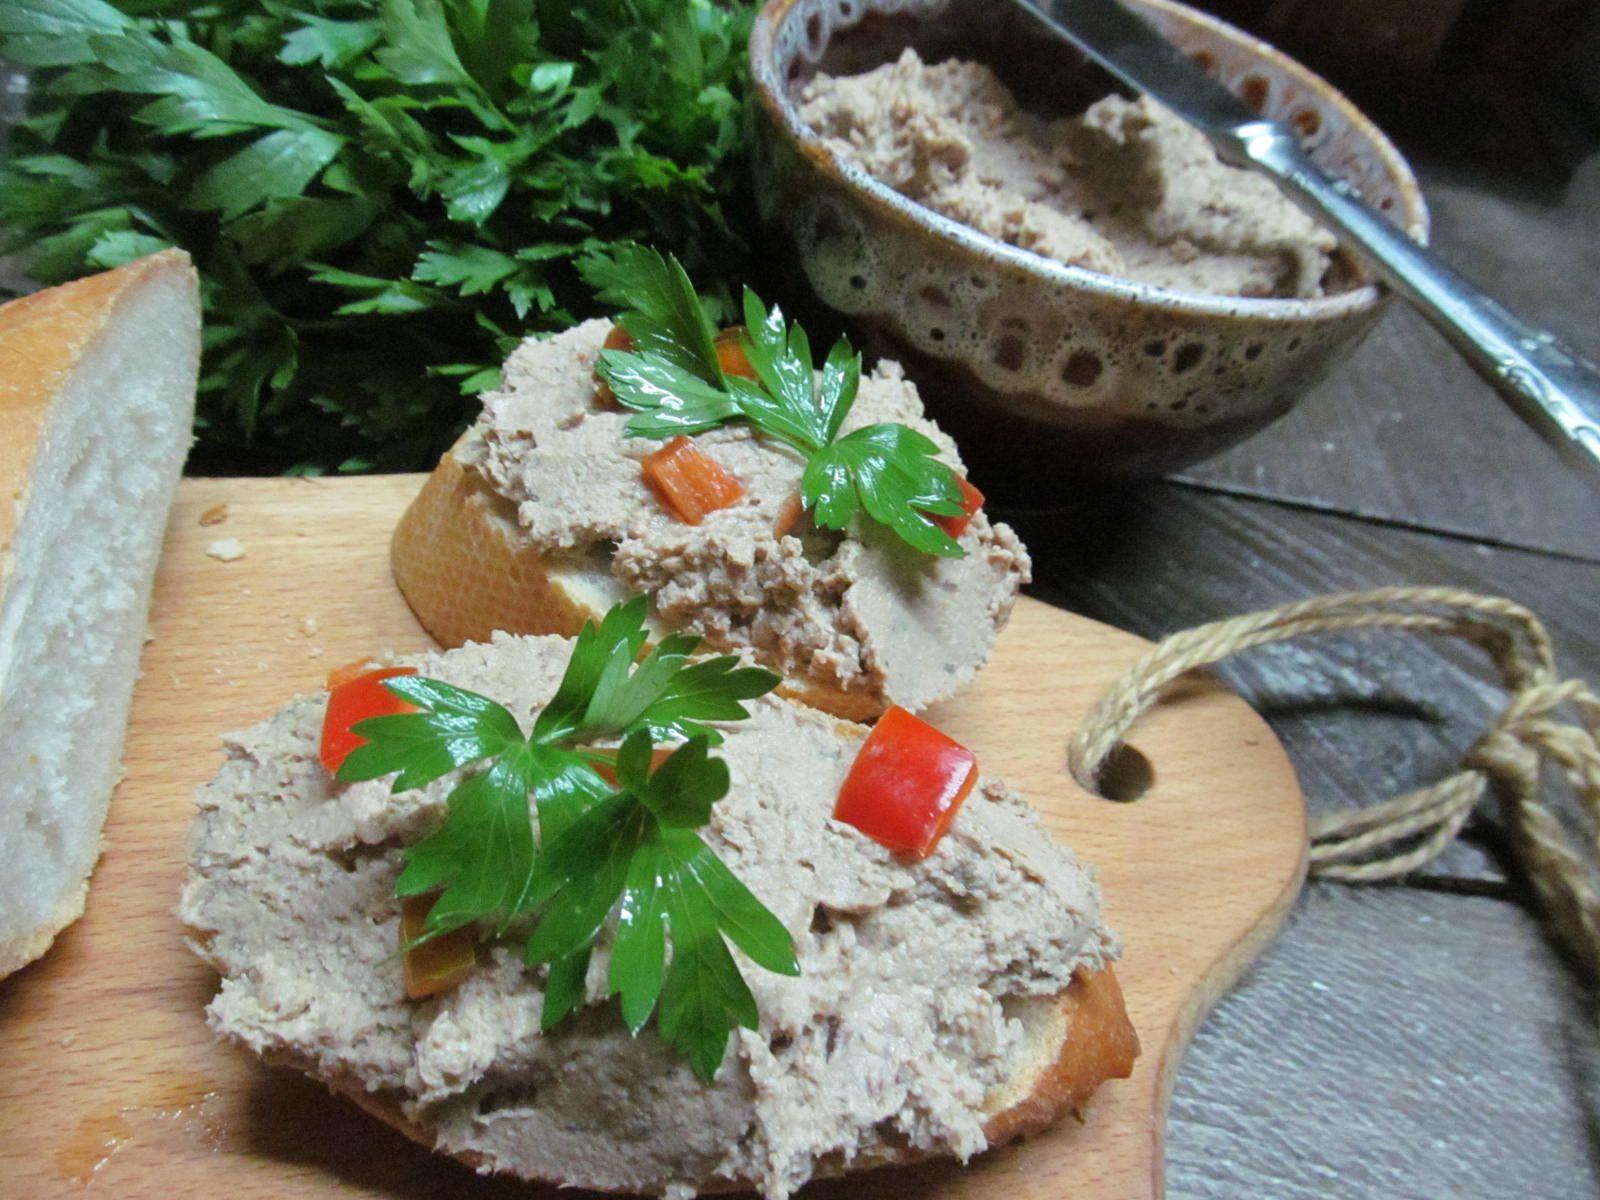 Pashtet Iz Kurinoj Pecheni Recept Byudzhetnaya Kulinariya Idei Dlya Blyud I Pashtet Iz Kurinoj Pecheni